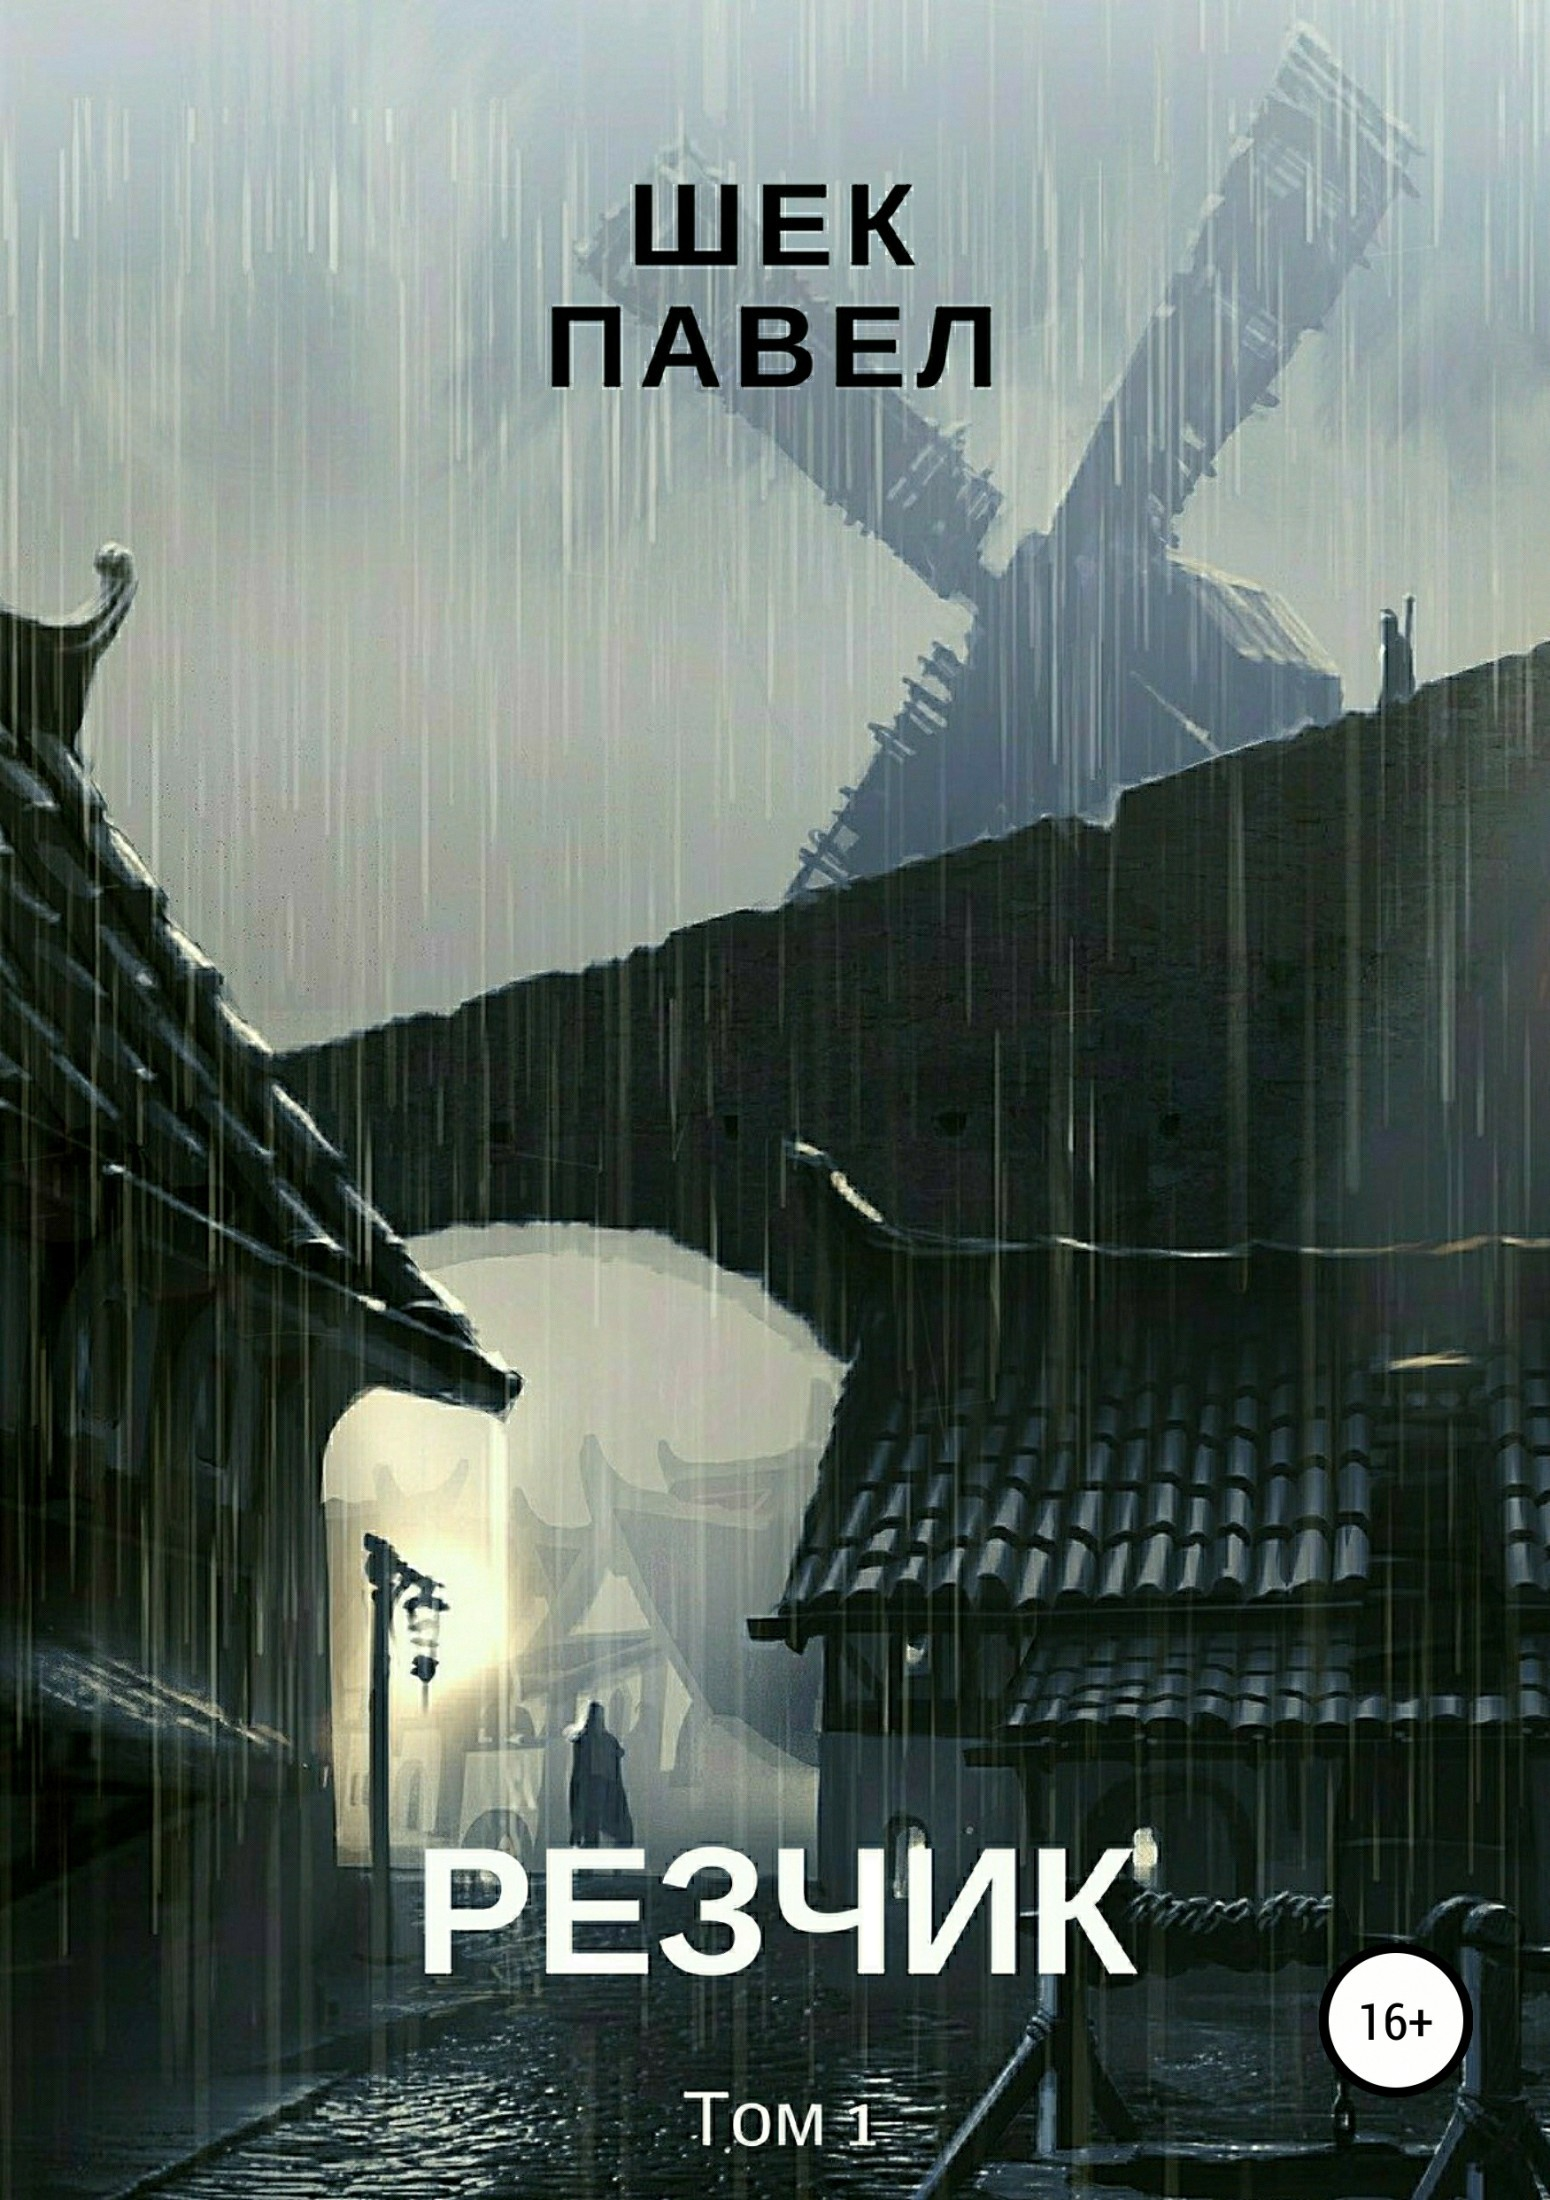 Павел Александрович Шек Резчик. Том1